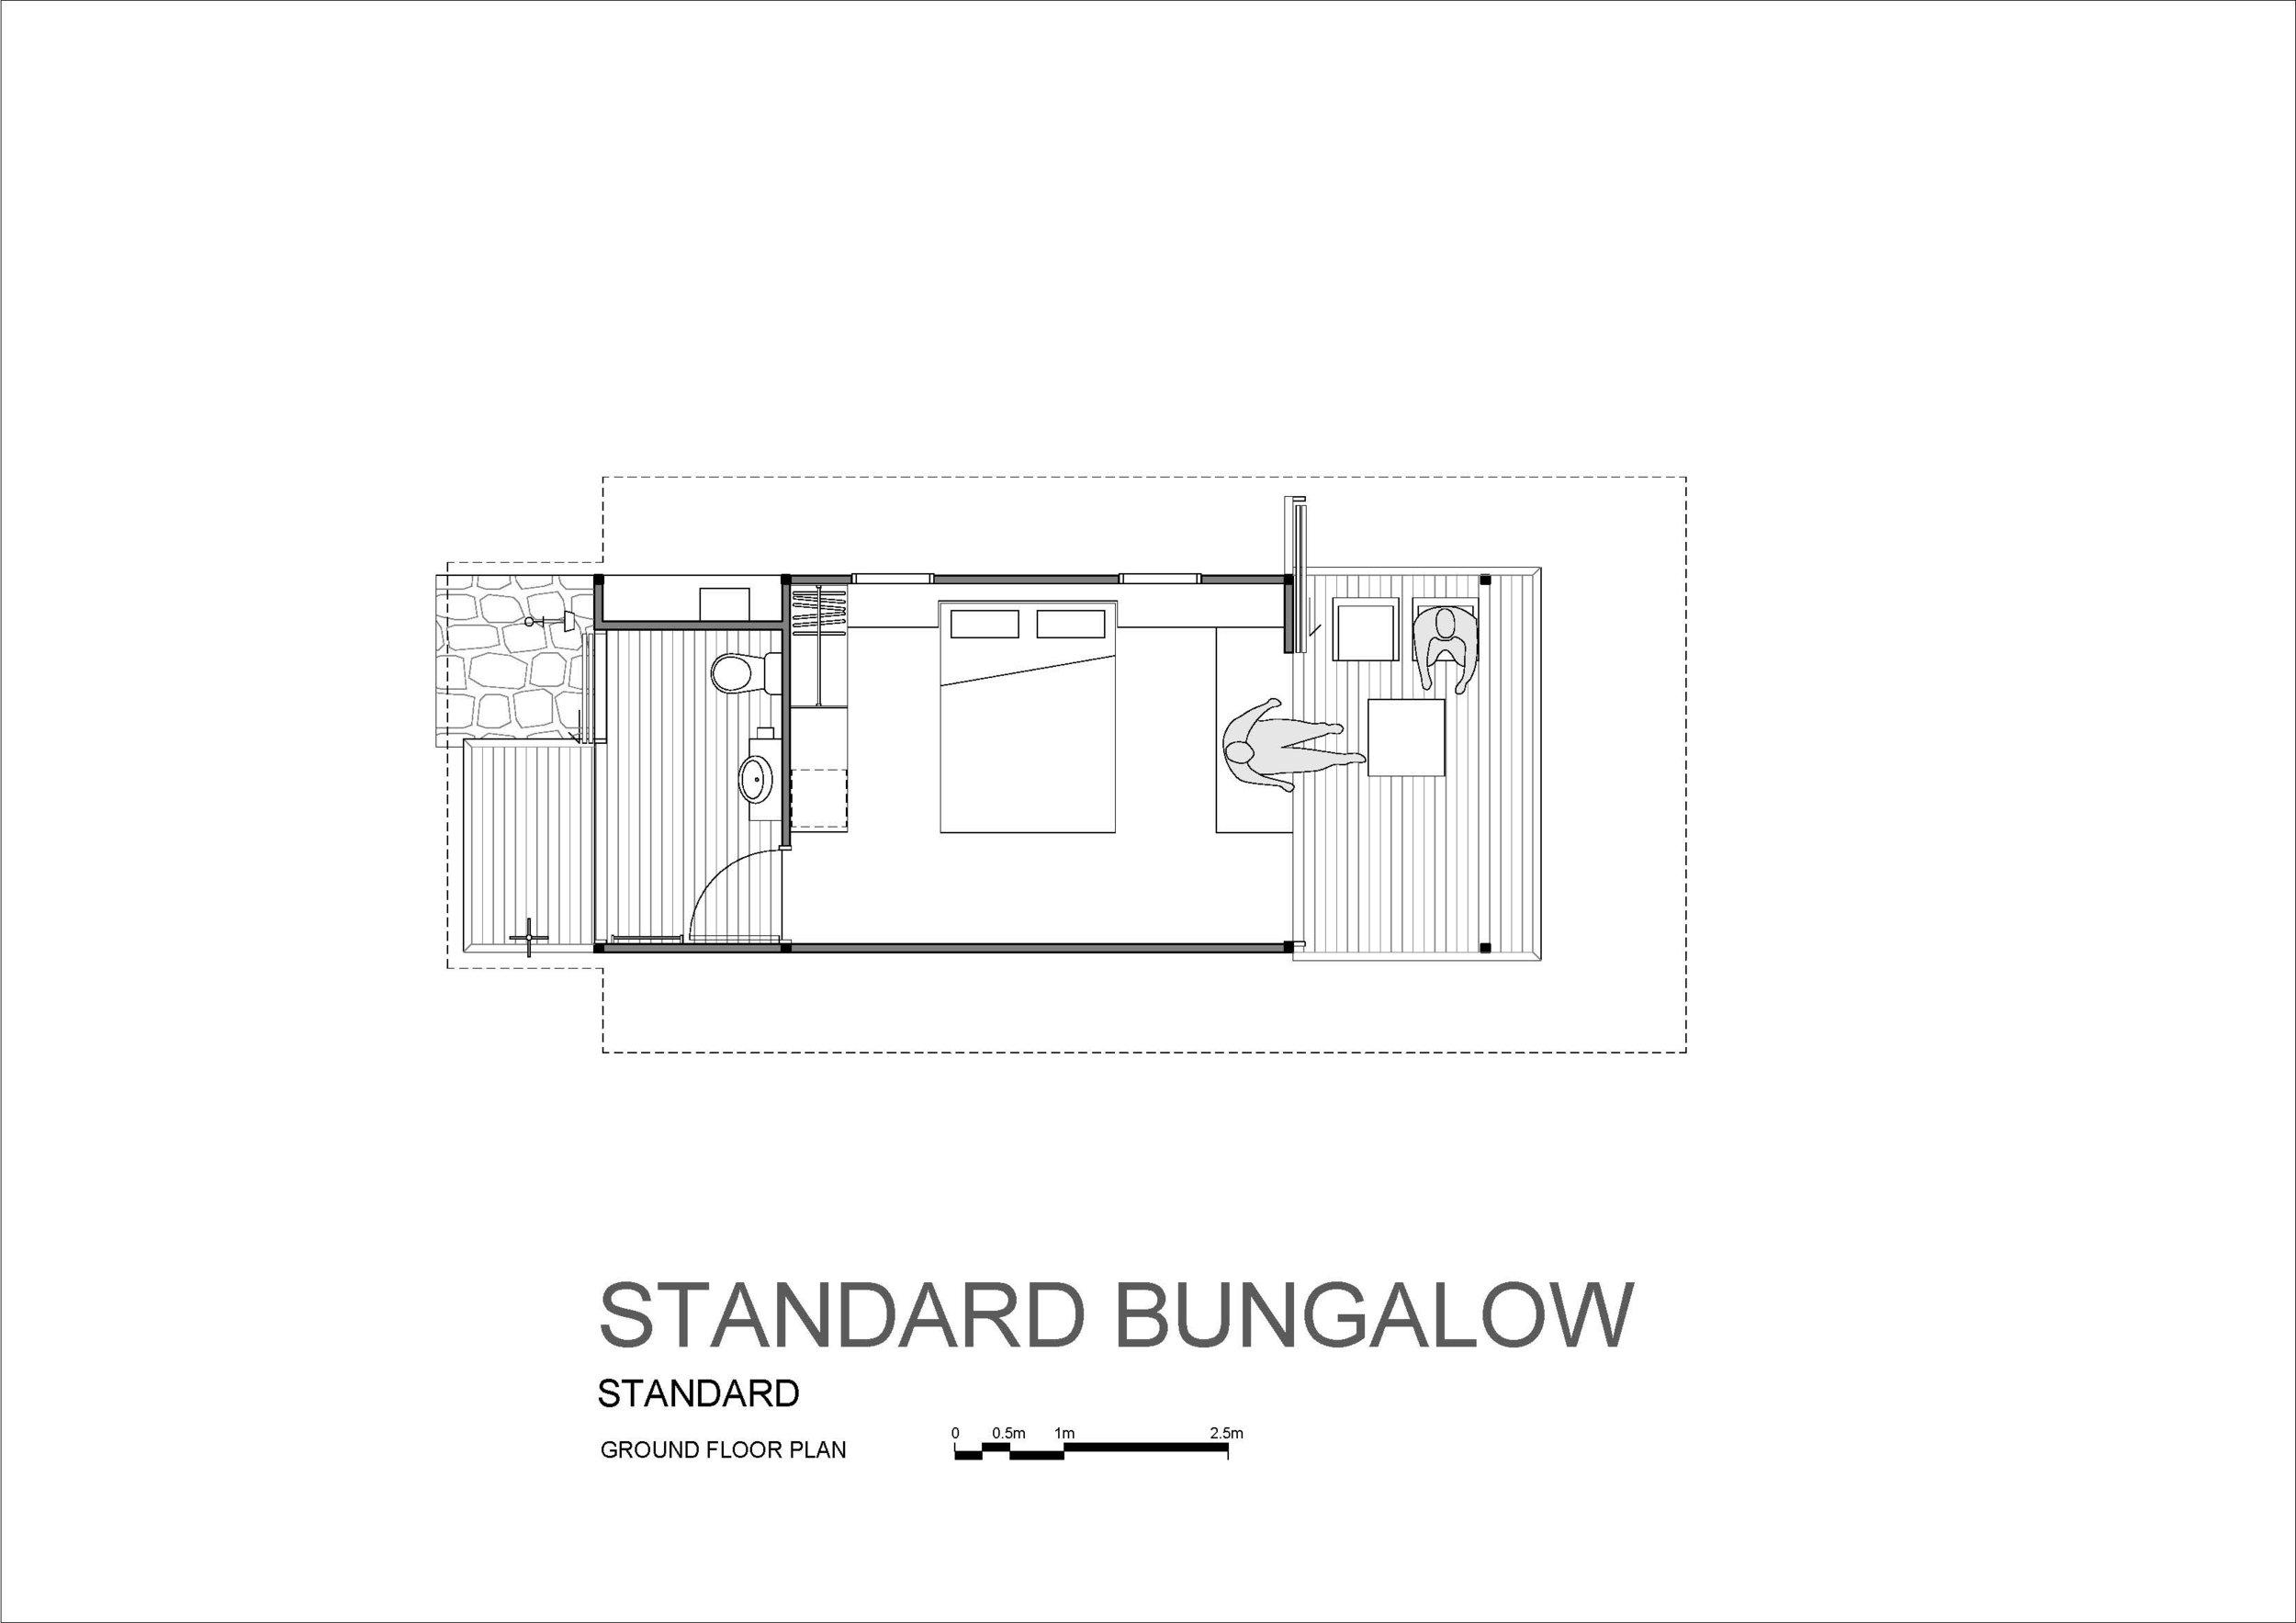 STANDARD BUNGALOW_Page_1.jpg